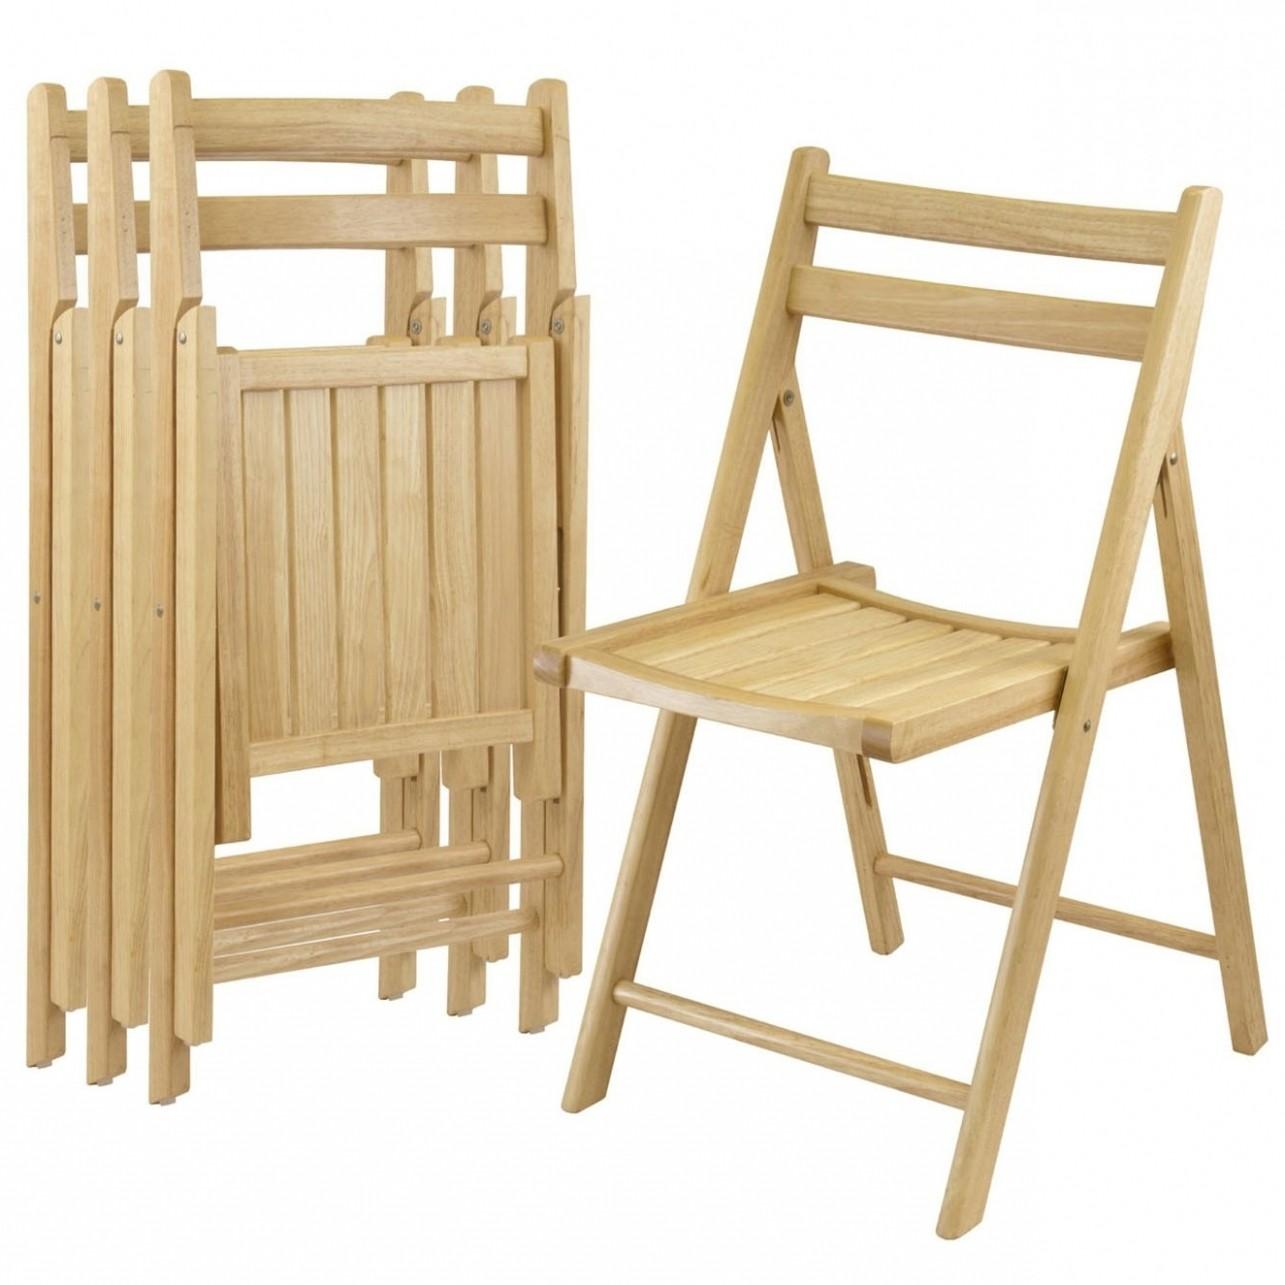 Beechwood Folding Chairs Set Of 4 Modern Chairs